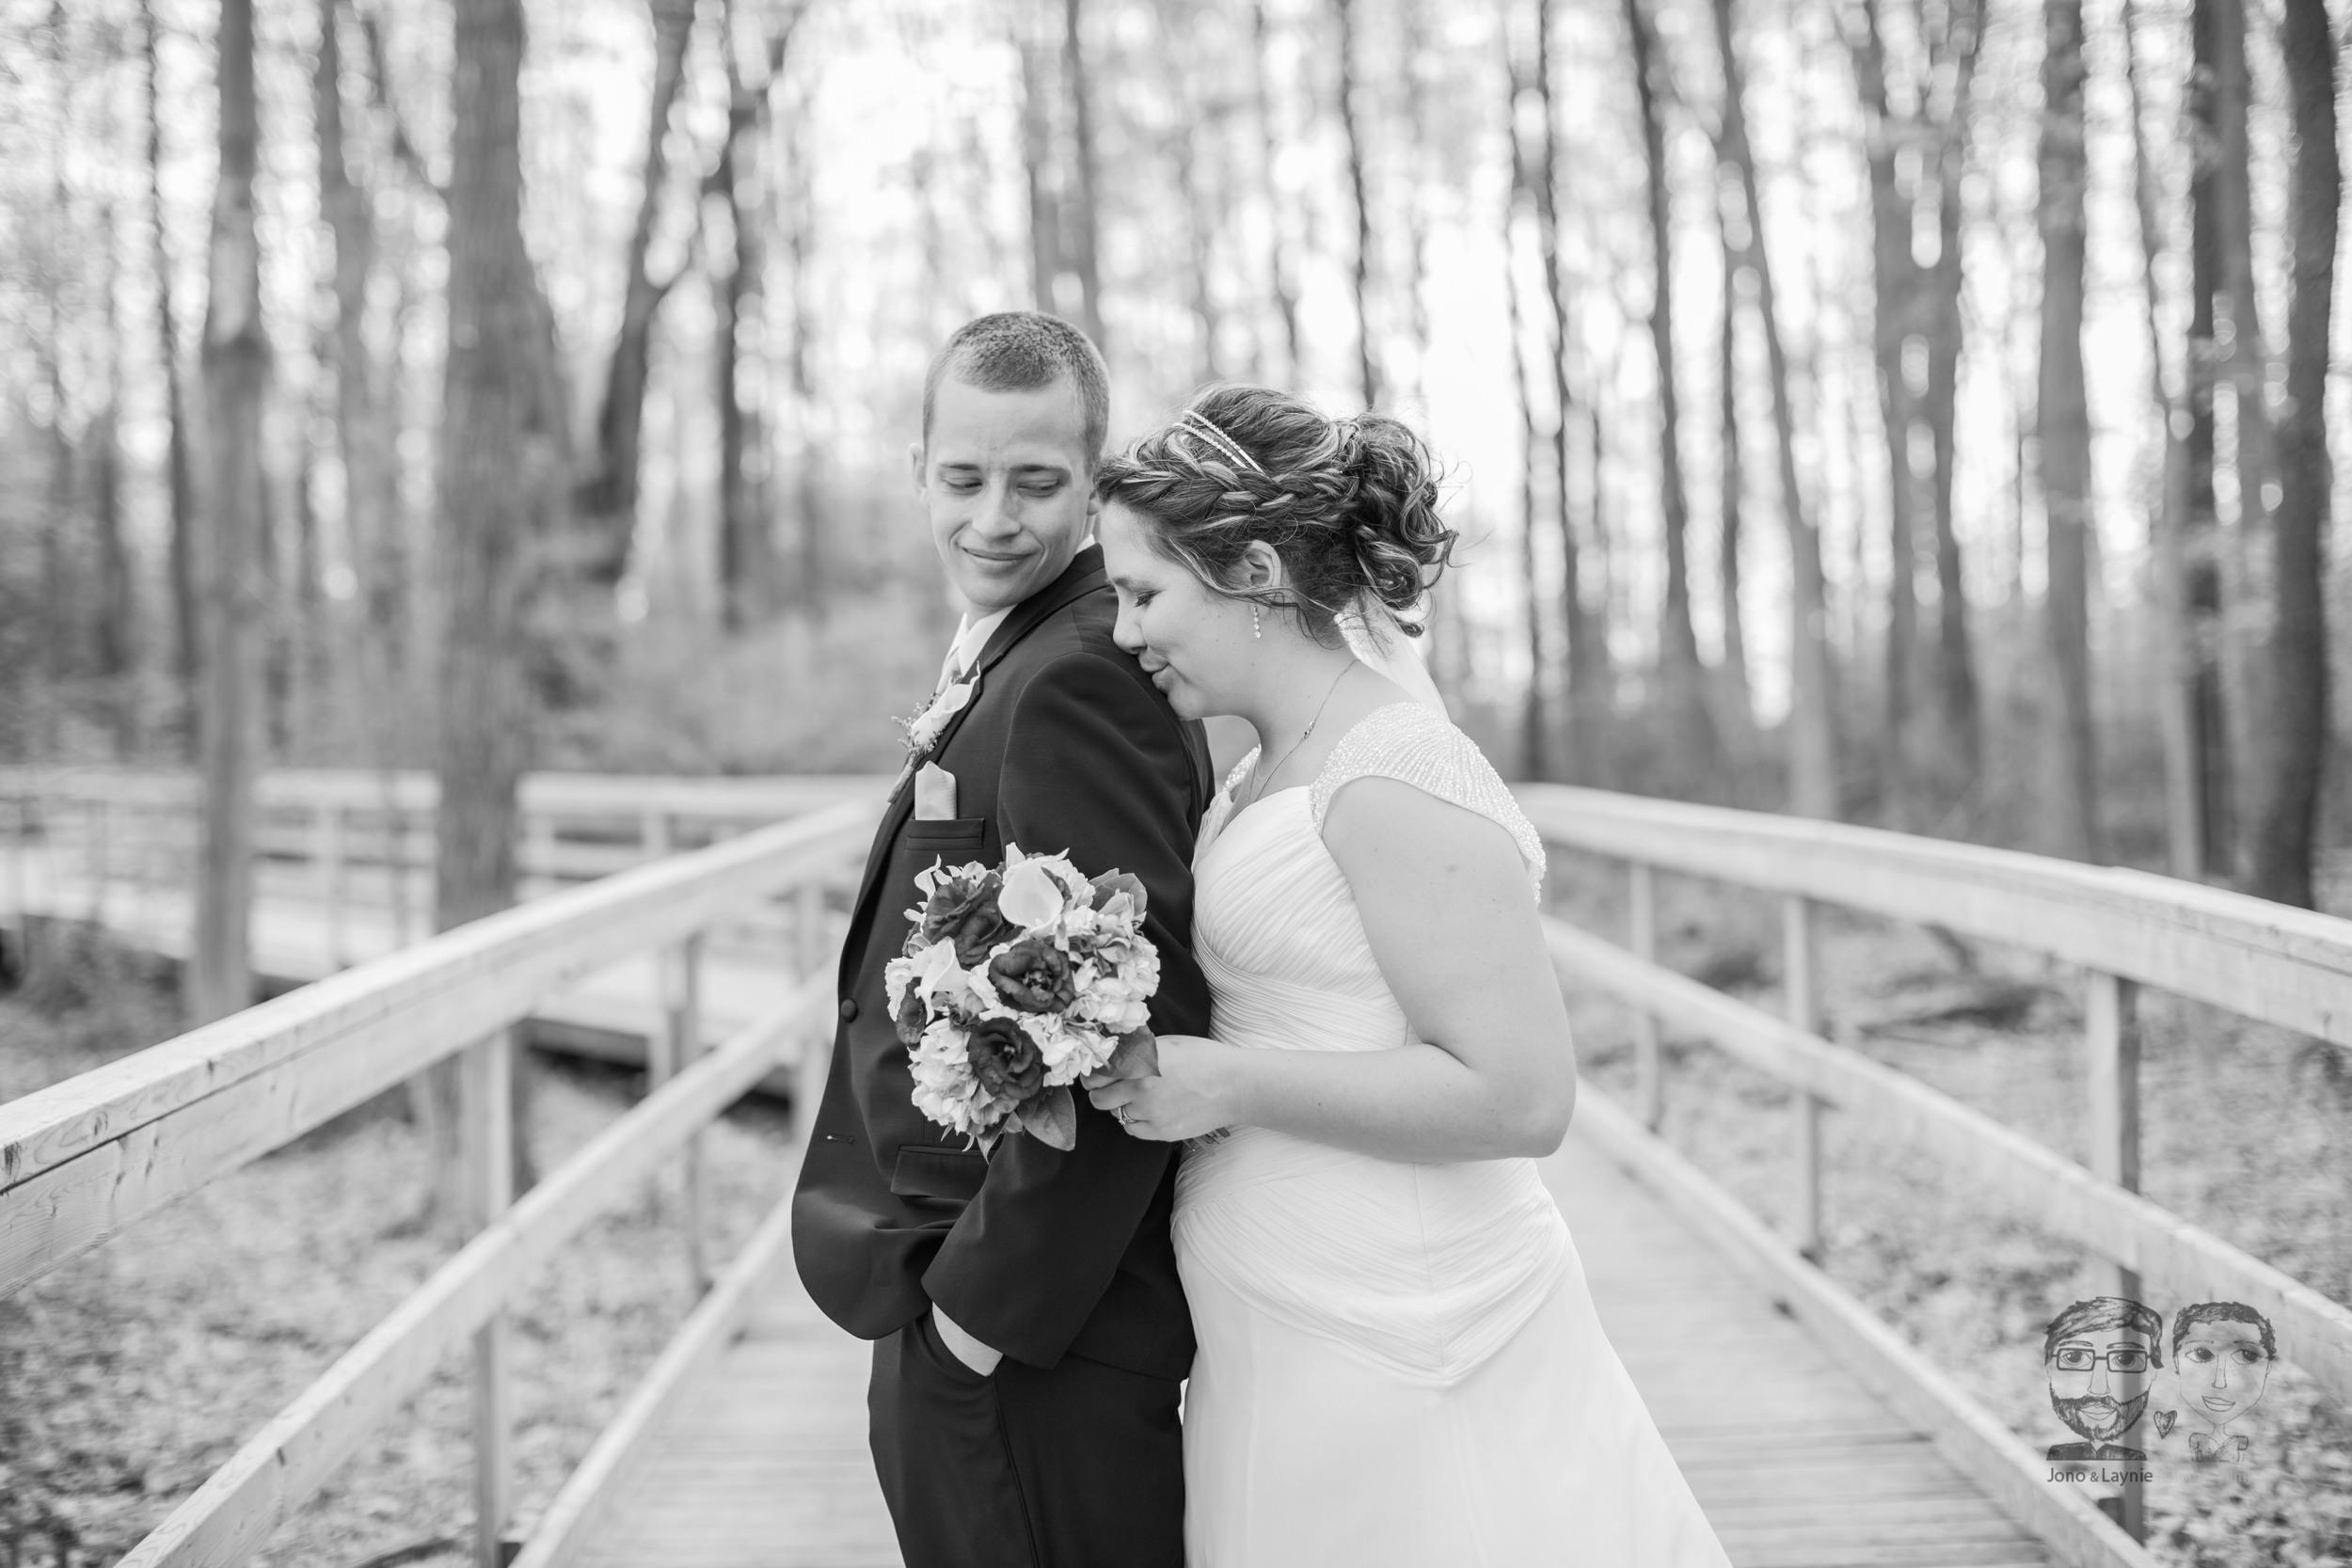 55Toronto Wedding Photographers and Videographers-Jono & Laynie Co.-Orangeville Wedding.jpg